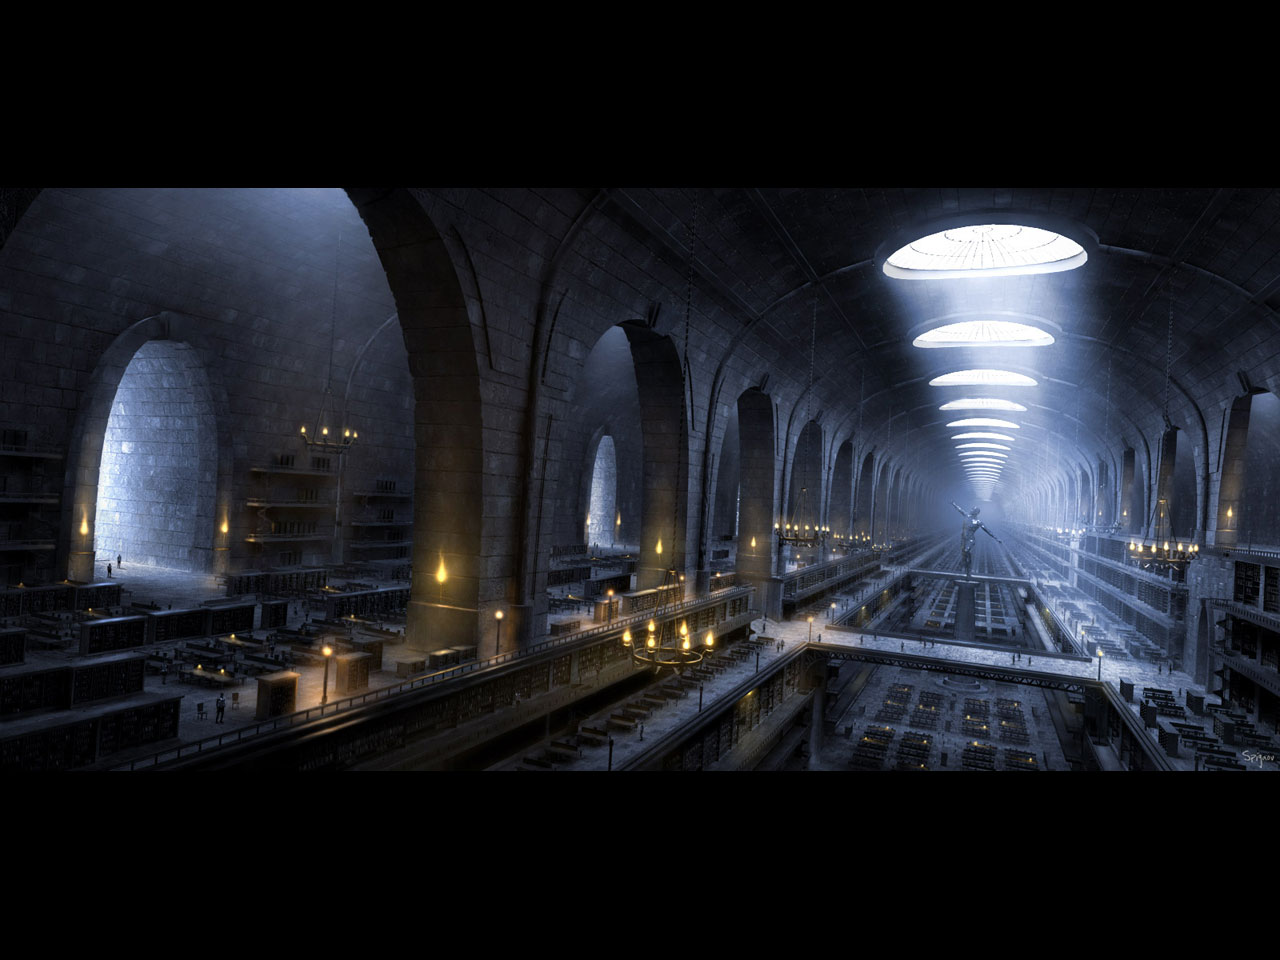 Library, 1280 x 960pix wallpaper Science Fiction, 3D ...